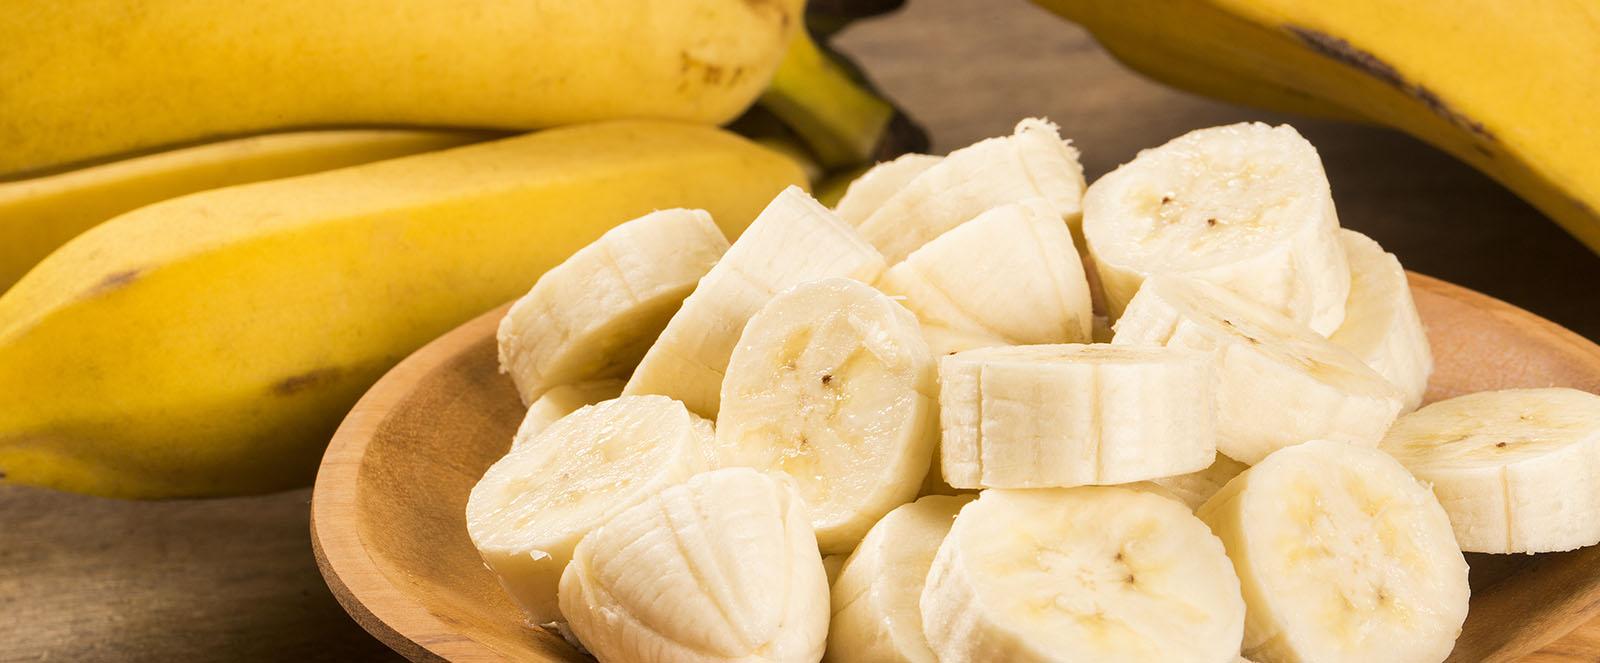 Bananen lagern: So geht's richtig